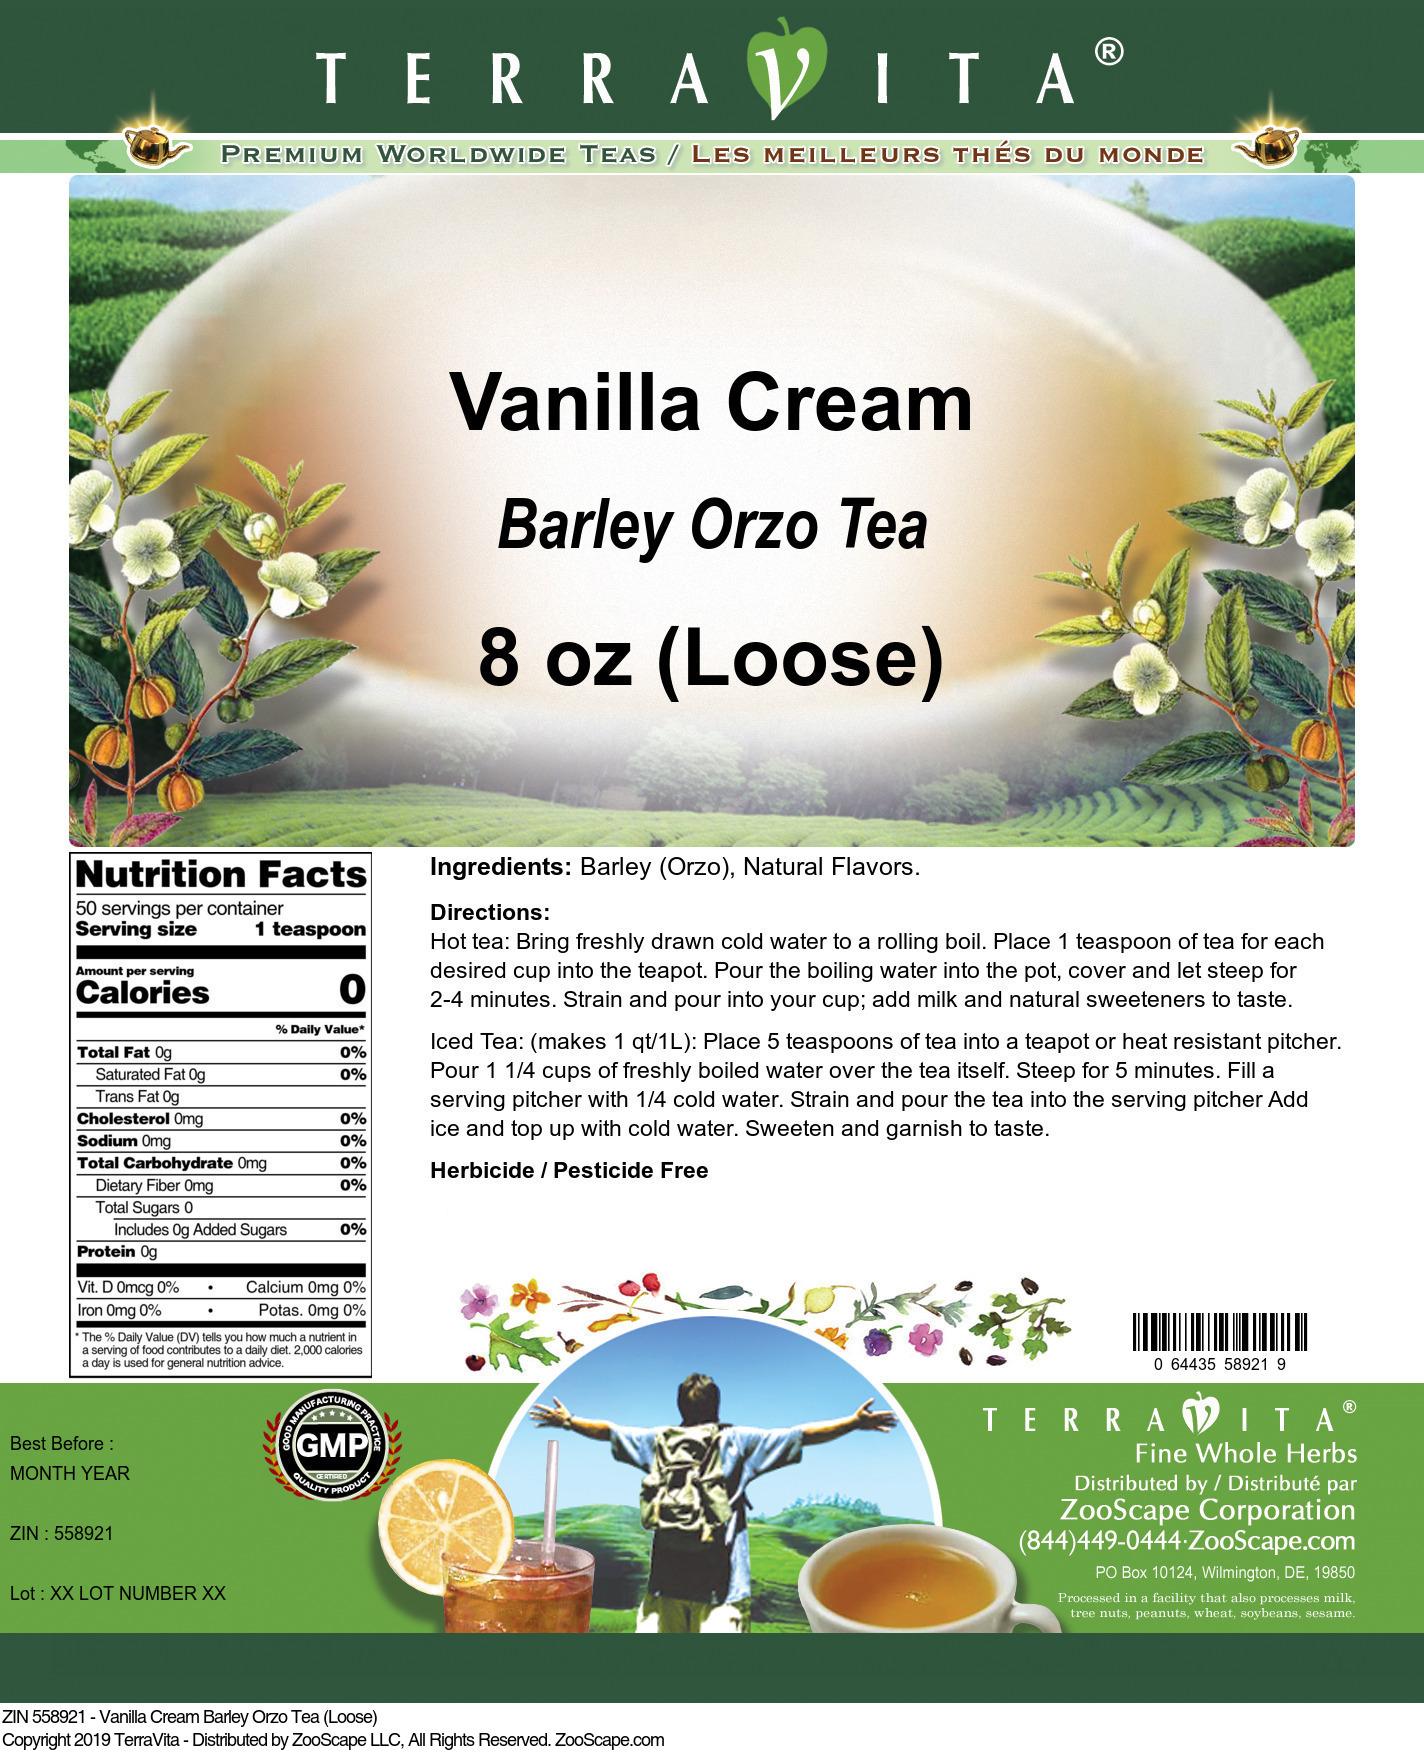 Vanilla Cream Barley Orzo